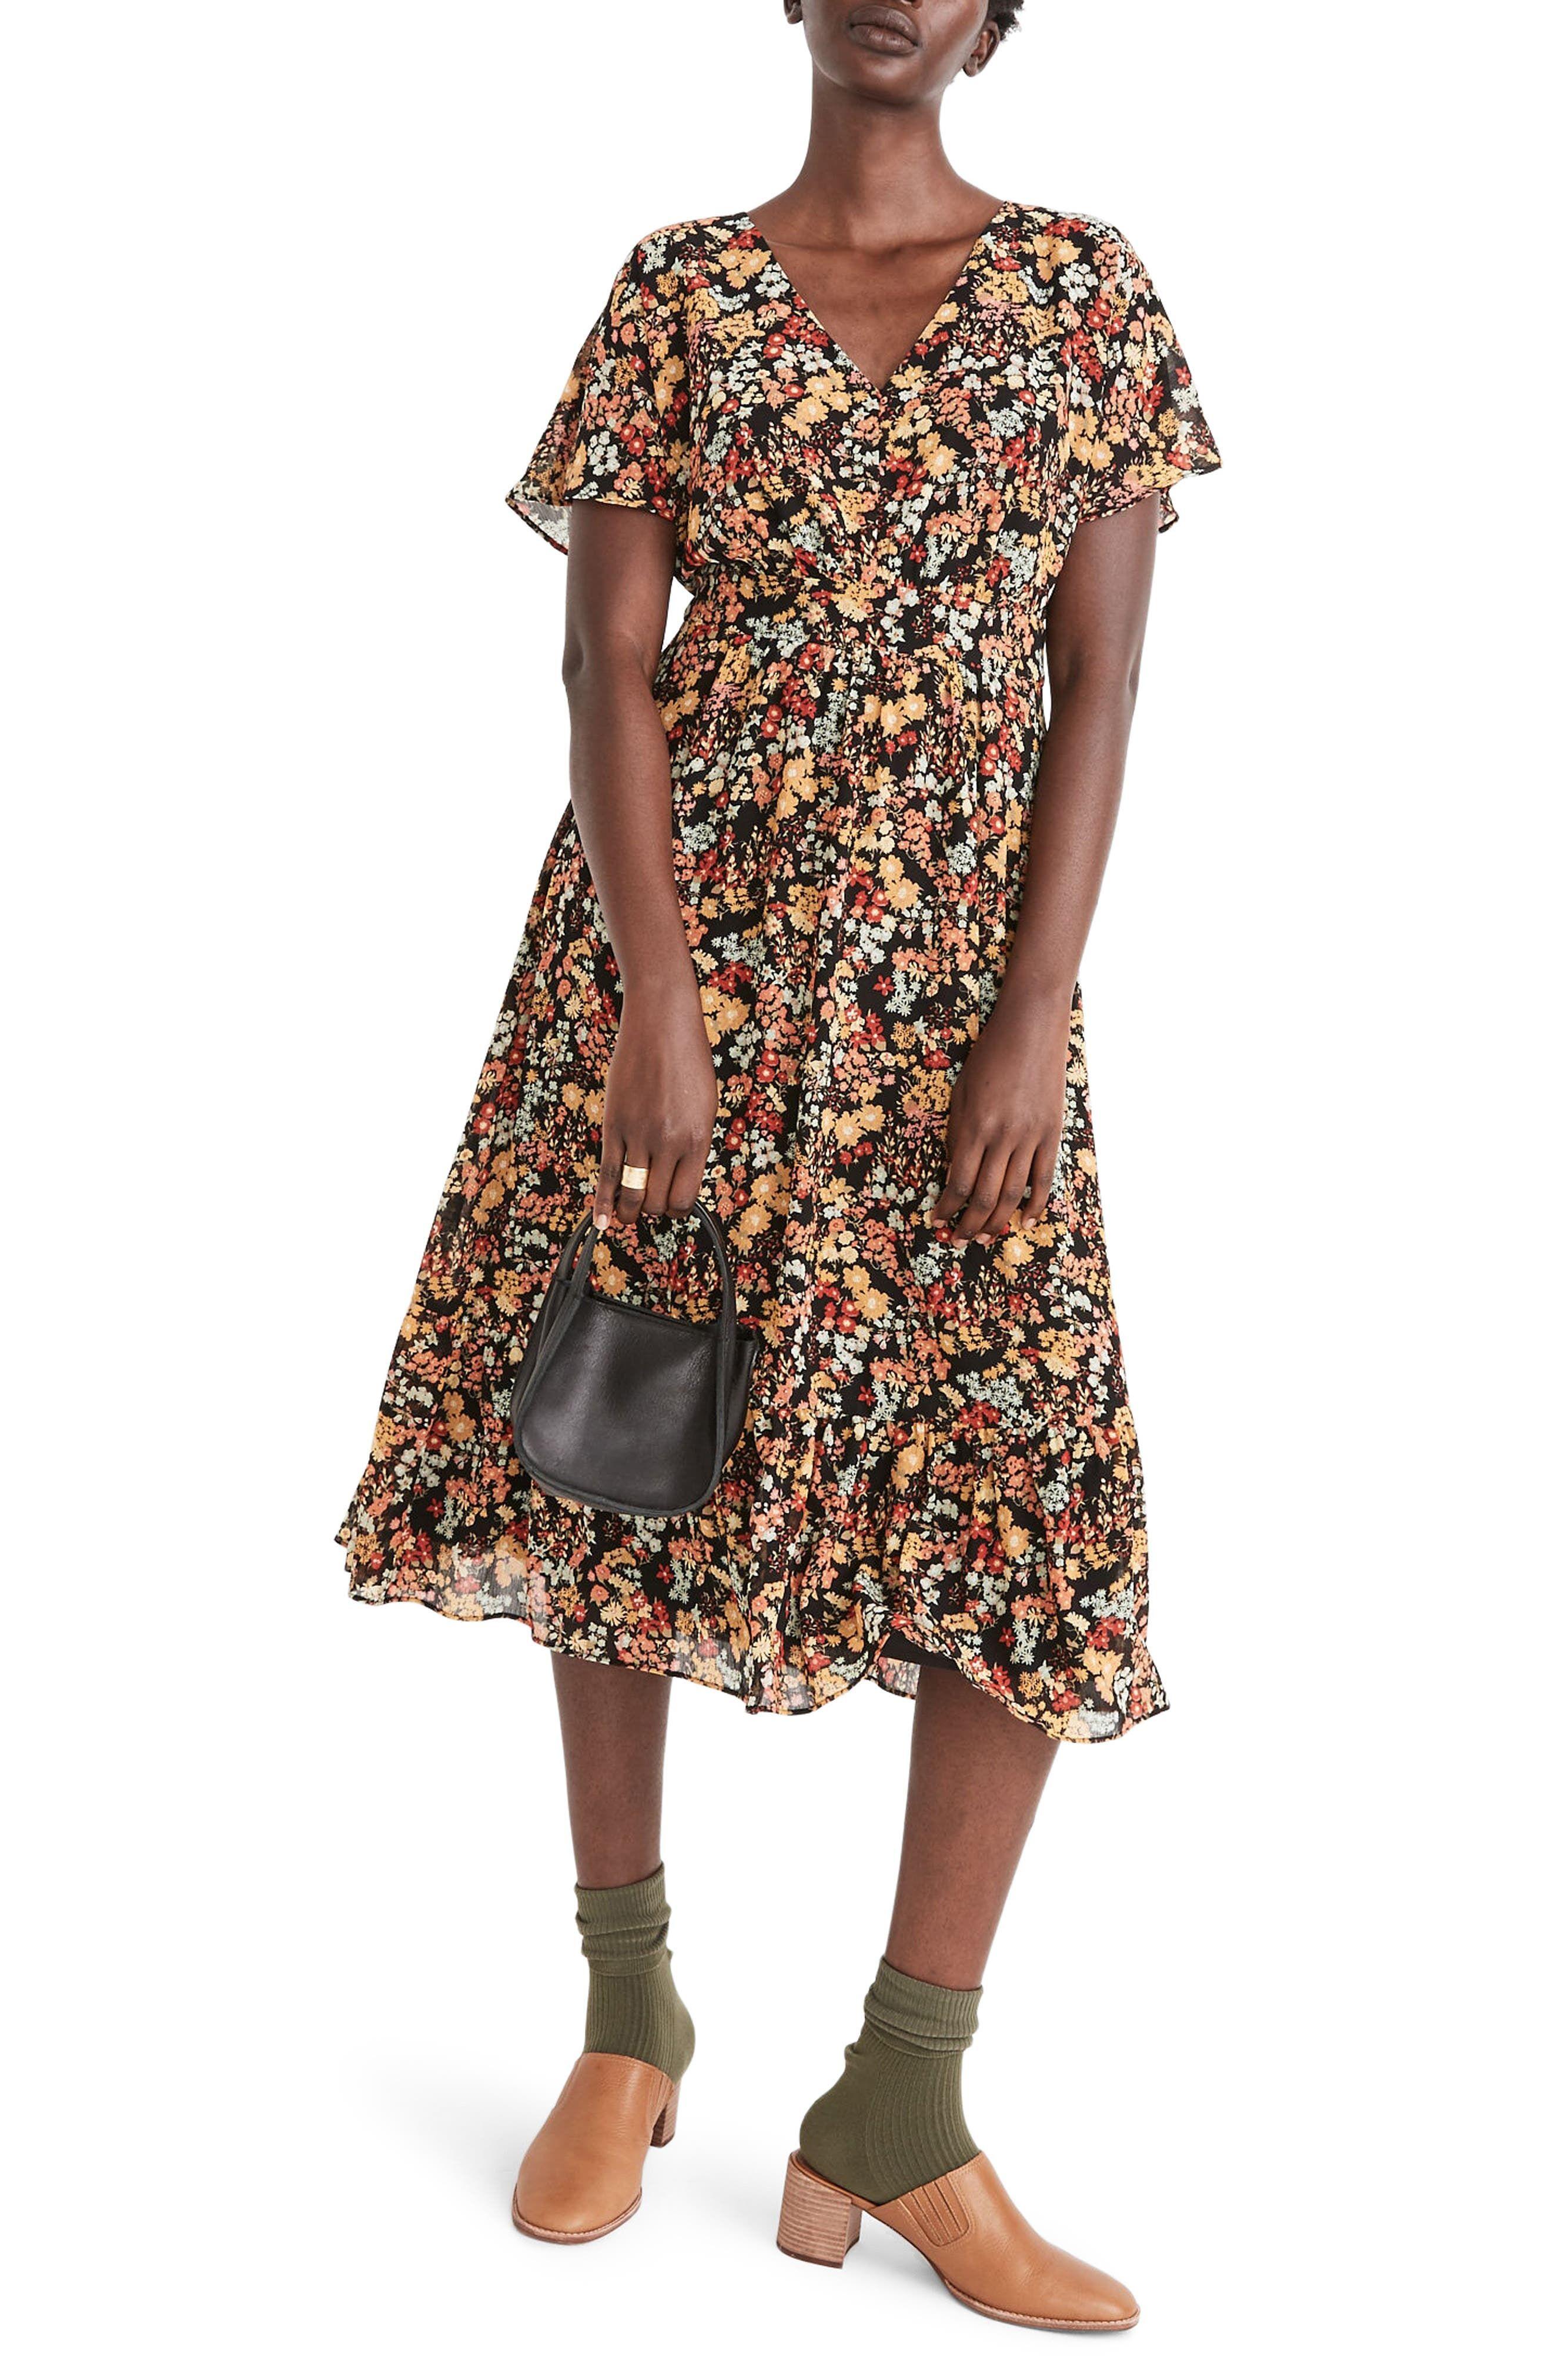 Madewell Women's Madewell Flower Garden Dolman Sleeve Ruffle Hem Midi Dress, Size 6 - Black